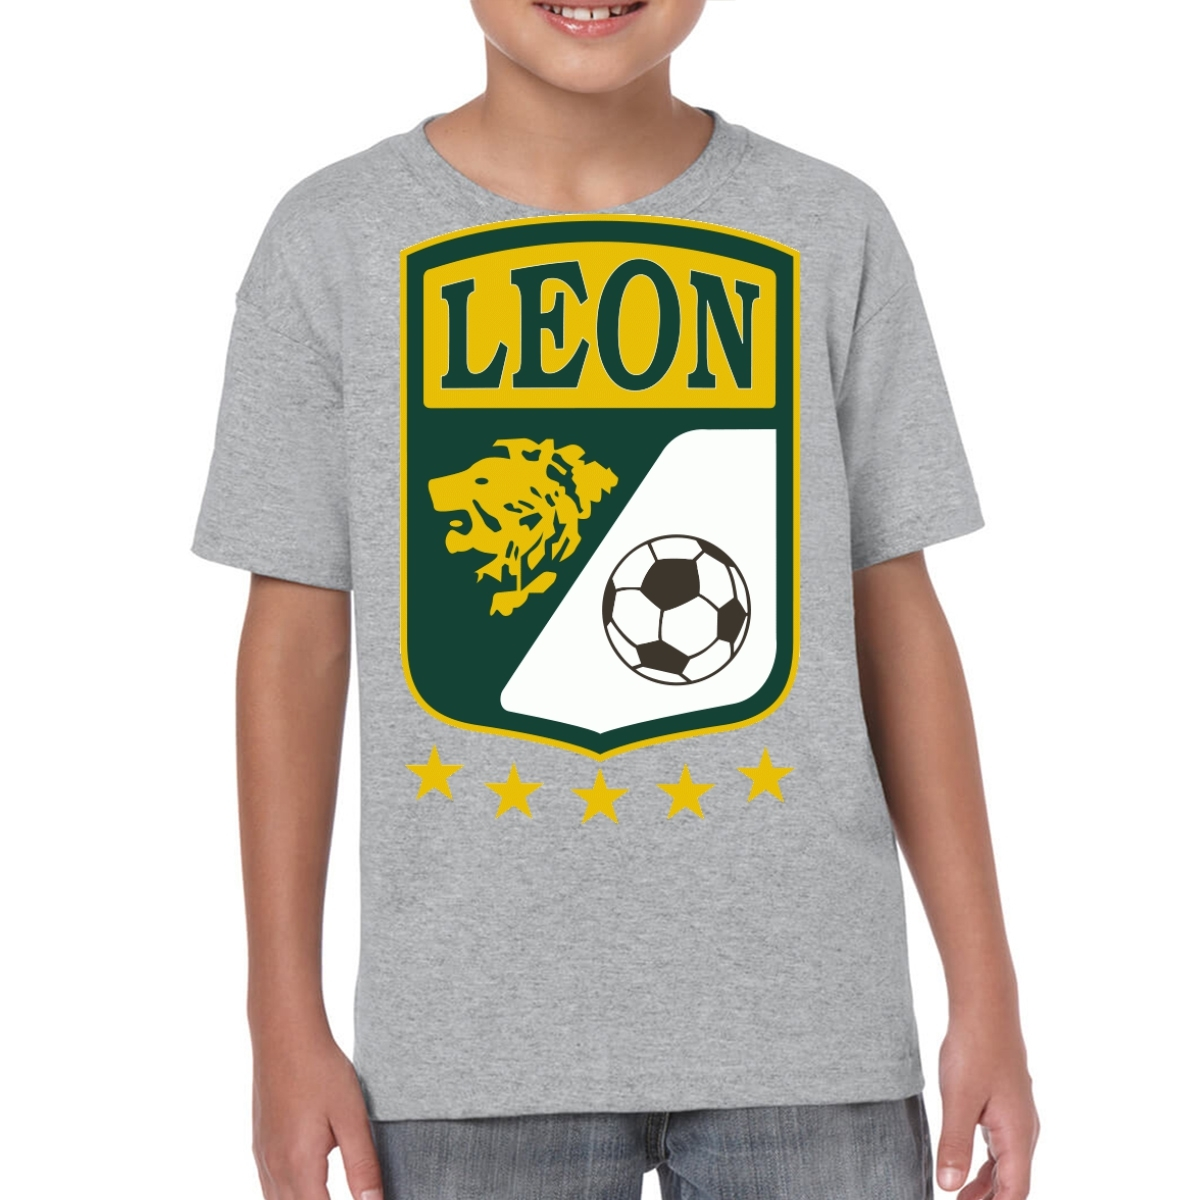 SOCCER Mexican Primera Club Leon Logo 0644 Kids T-Shirt for sale  USA